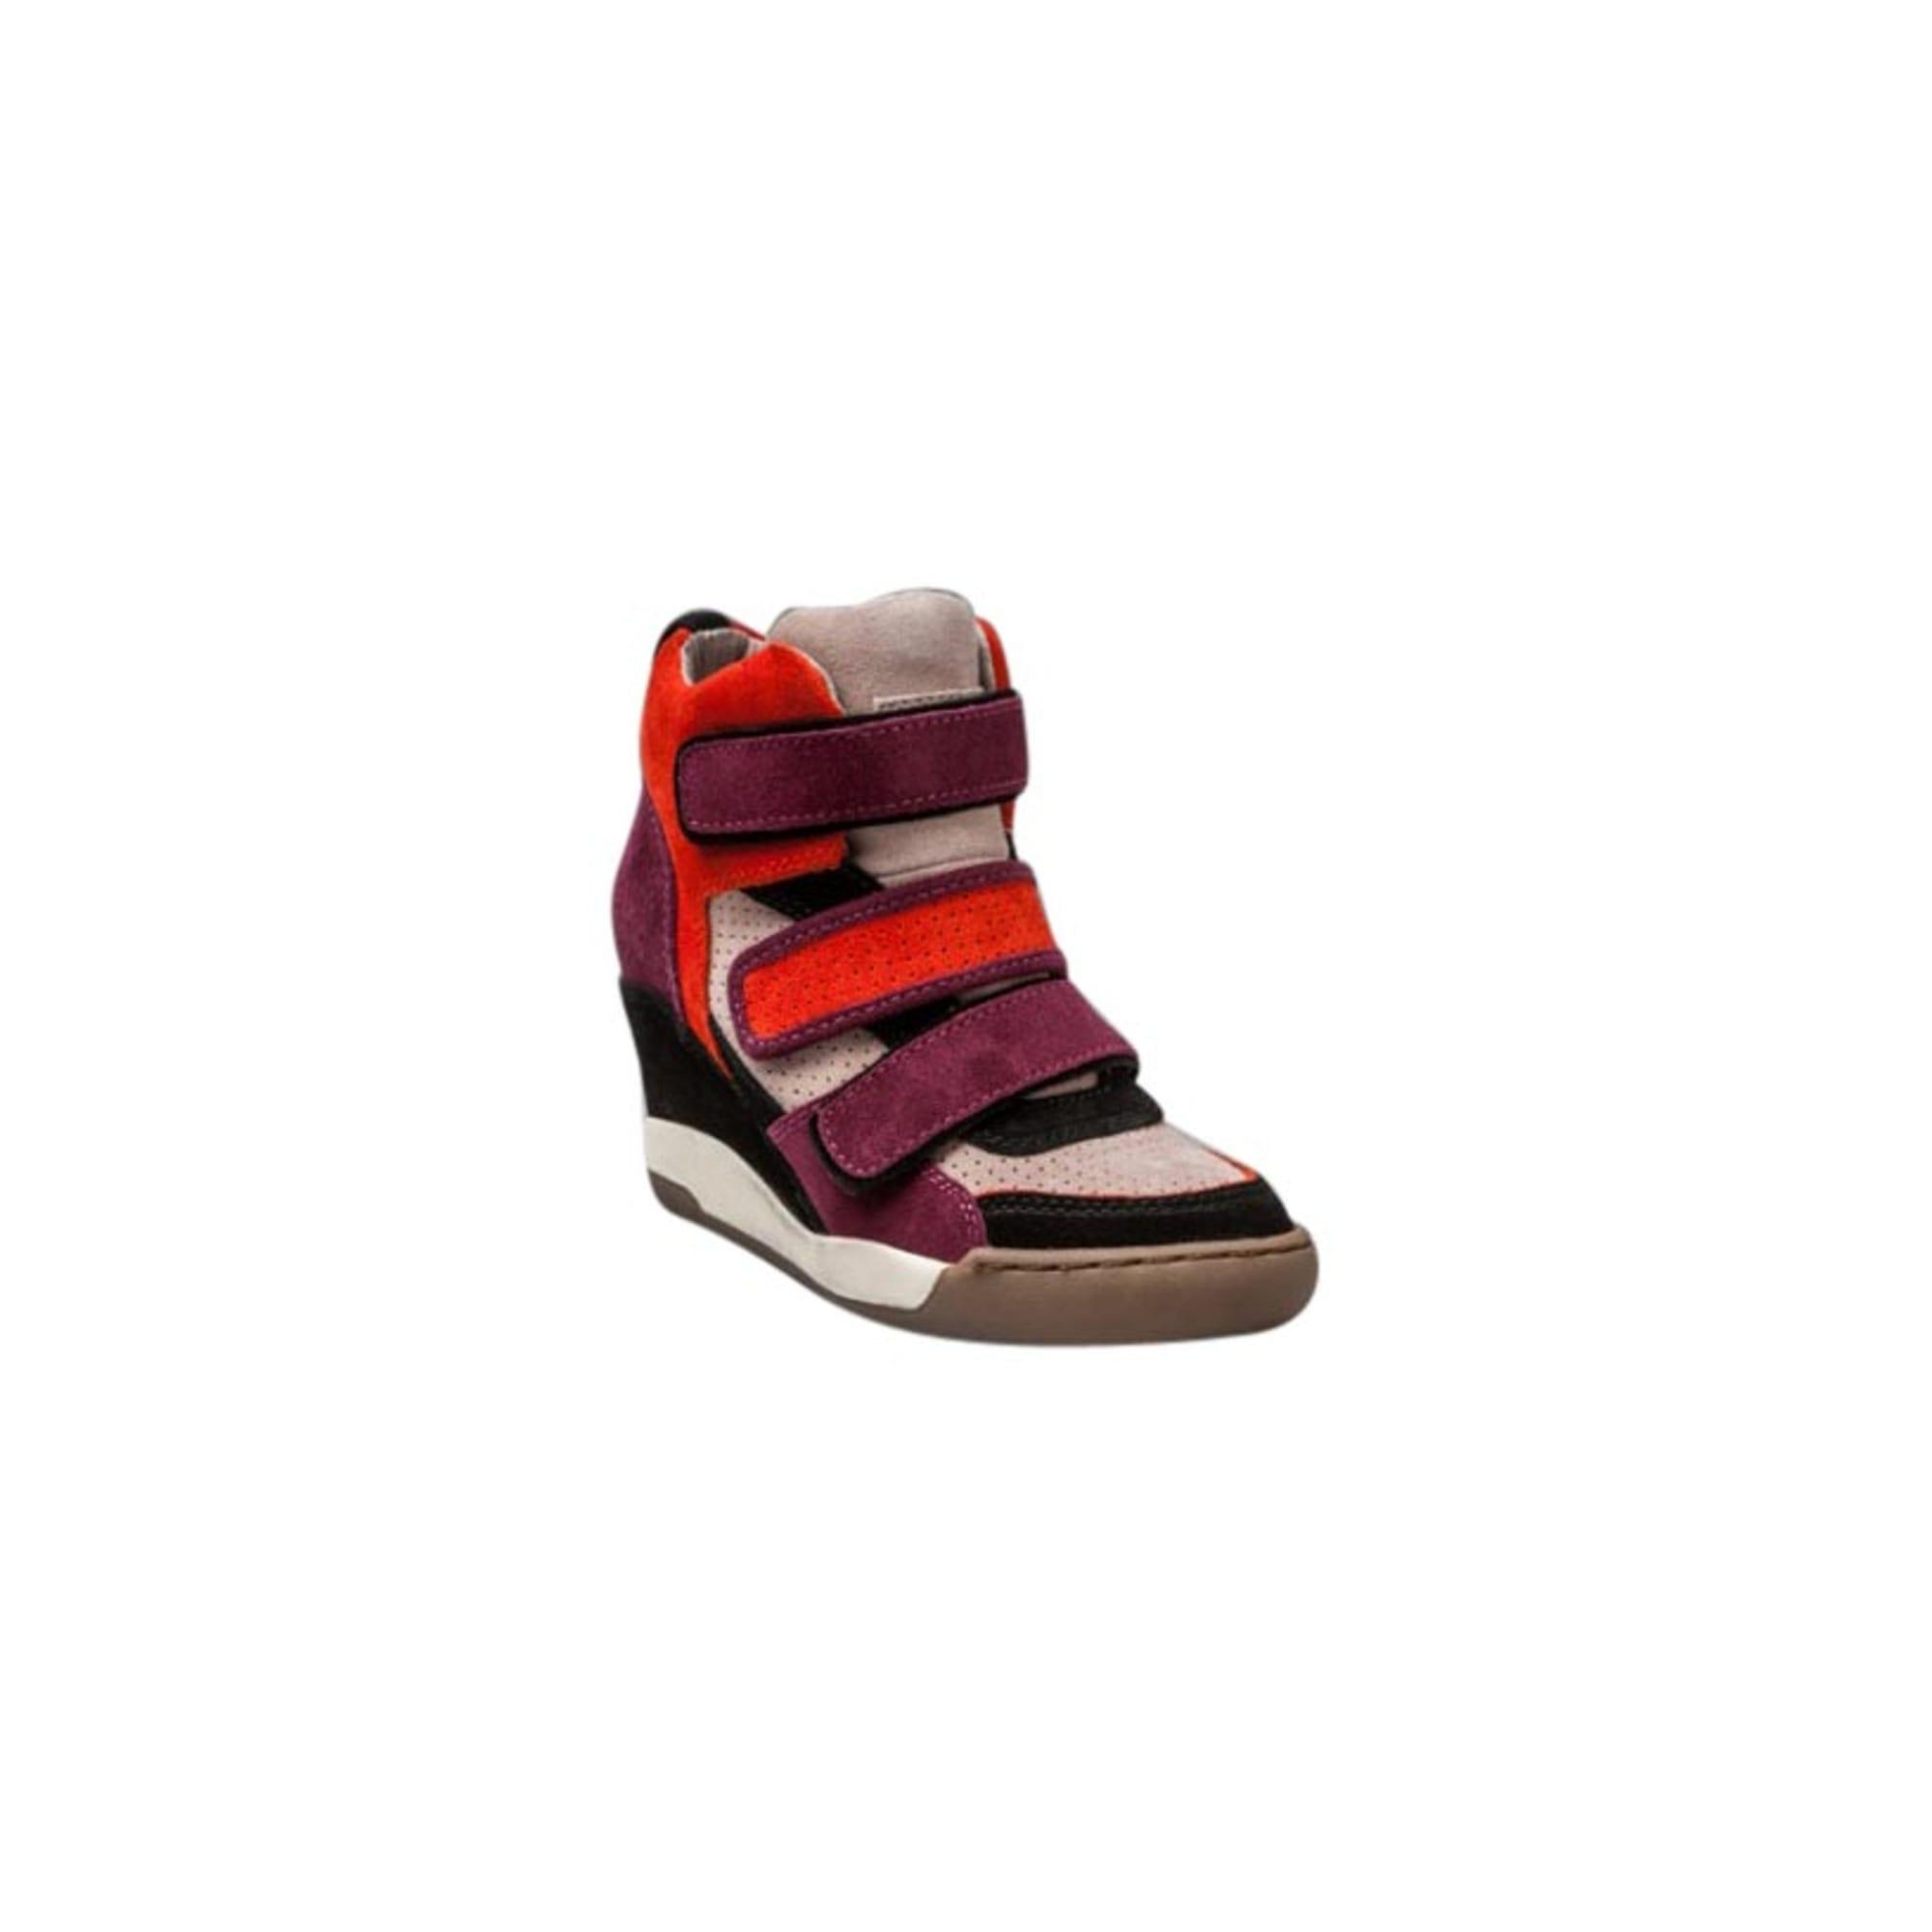 À Compensés Ash Boots Bottinesamp; Low qMGSVzpjLU